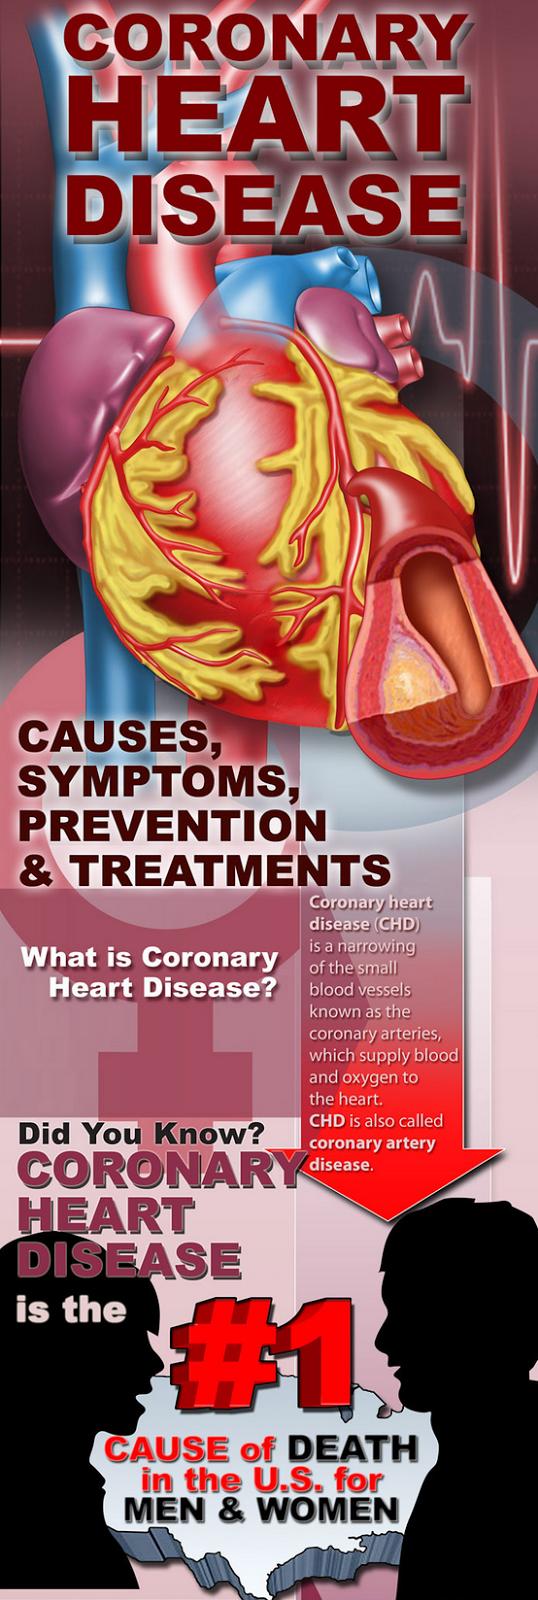 Heart Disease: Coronary Heart Disease Symptoms